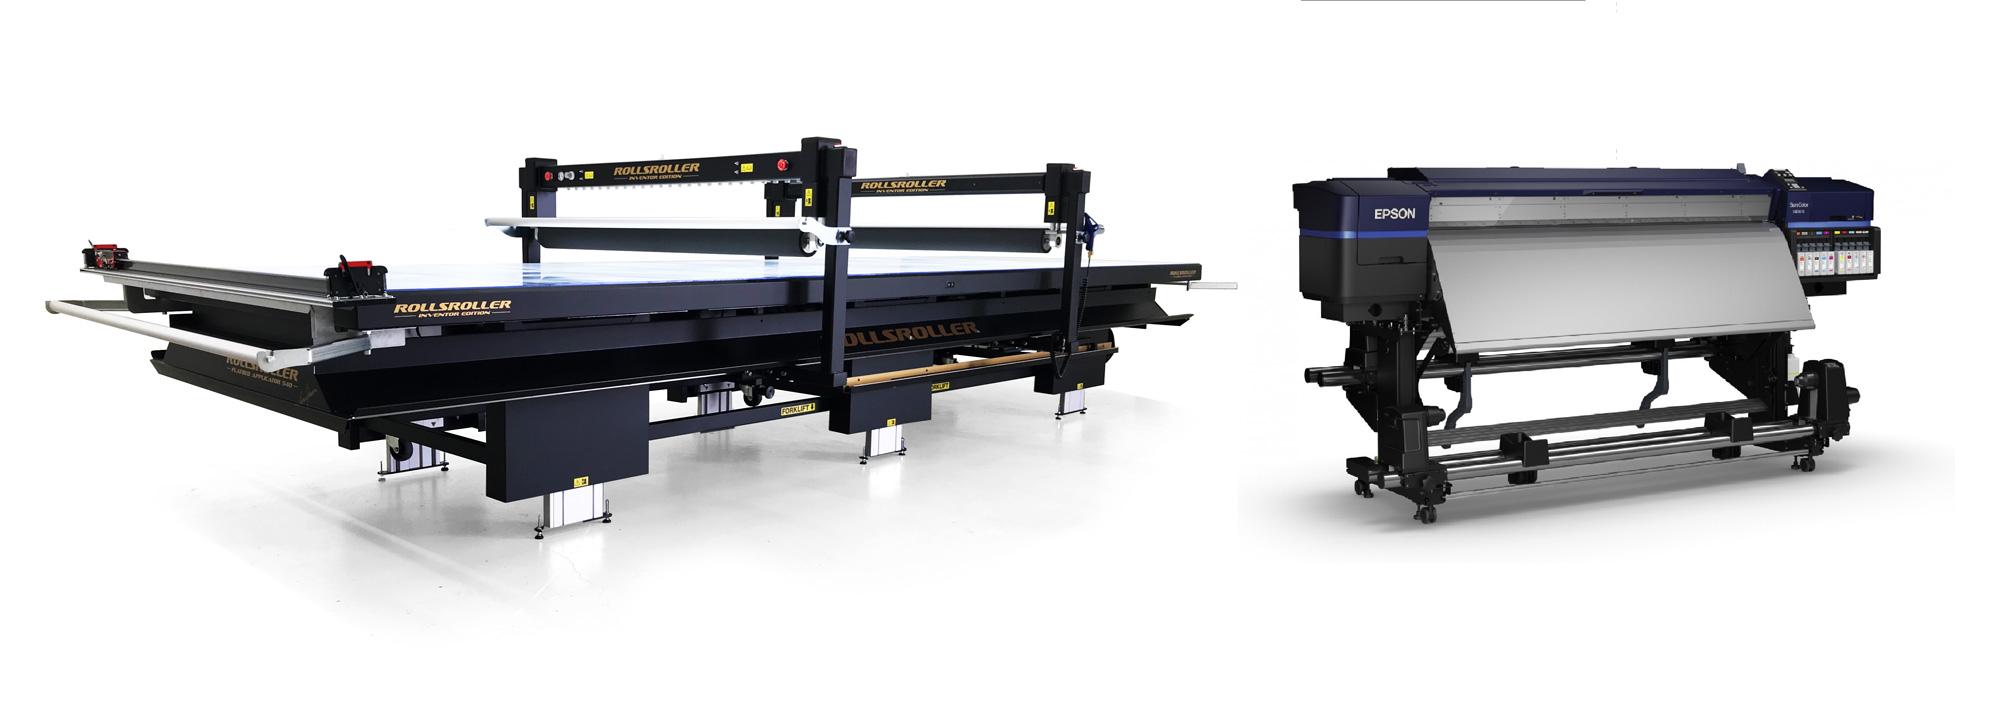 Ny produktionslinje til fuldfarve print på Flightcases